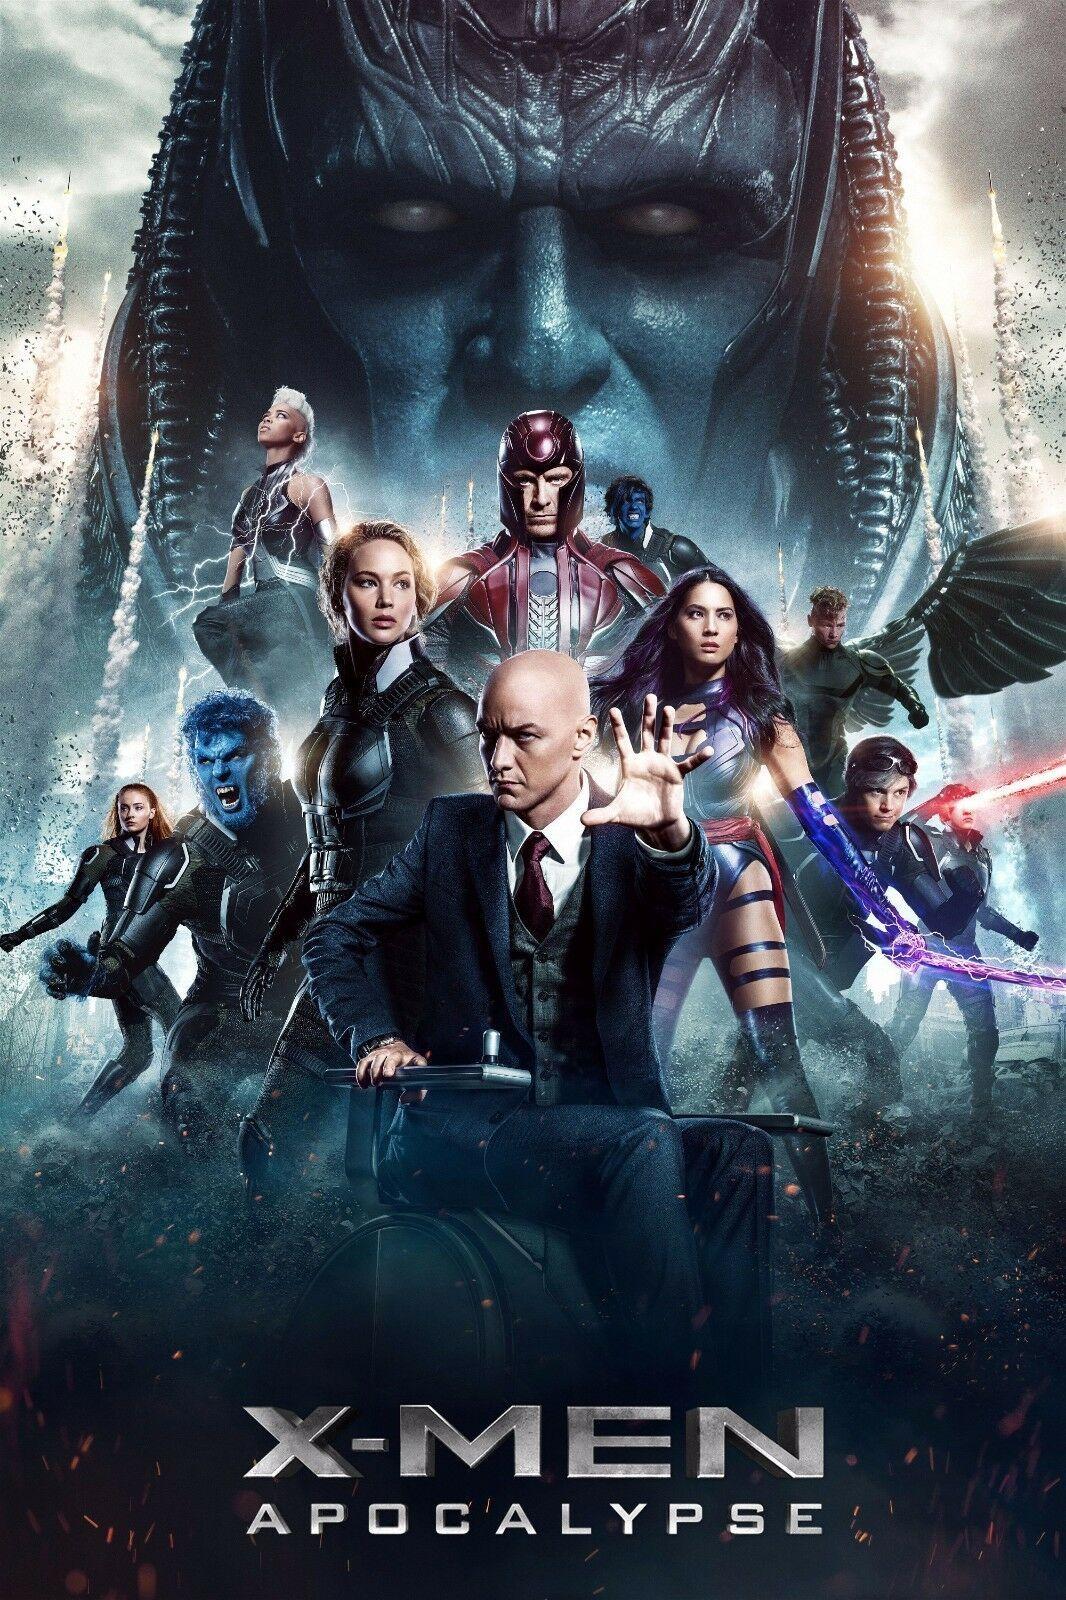 X-Men Days of Future Past 2014 24x36 Movie Poster - Magneto NEW